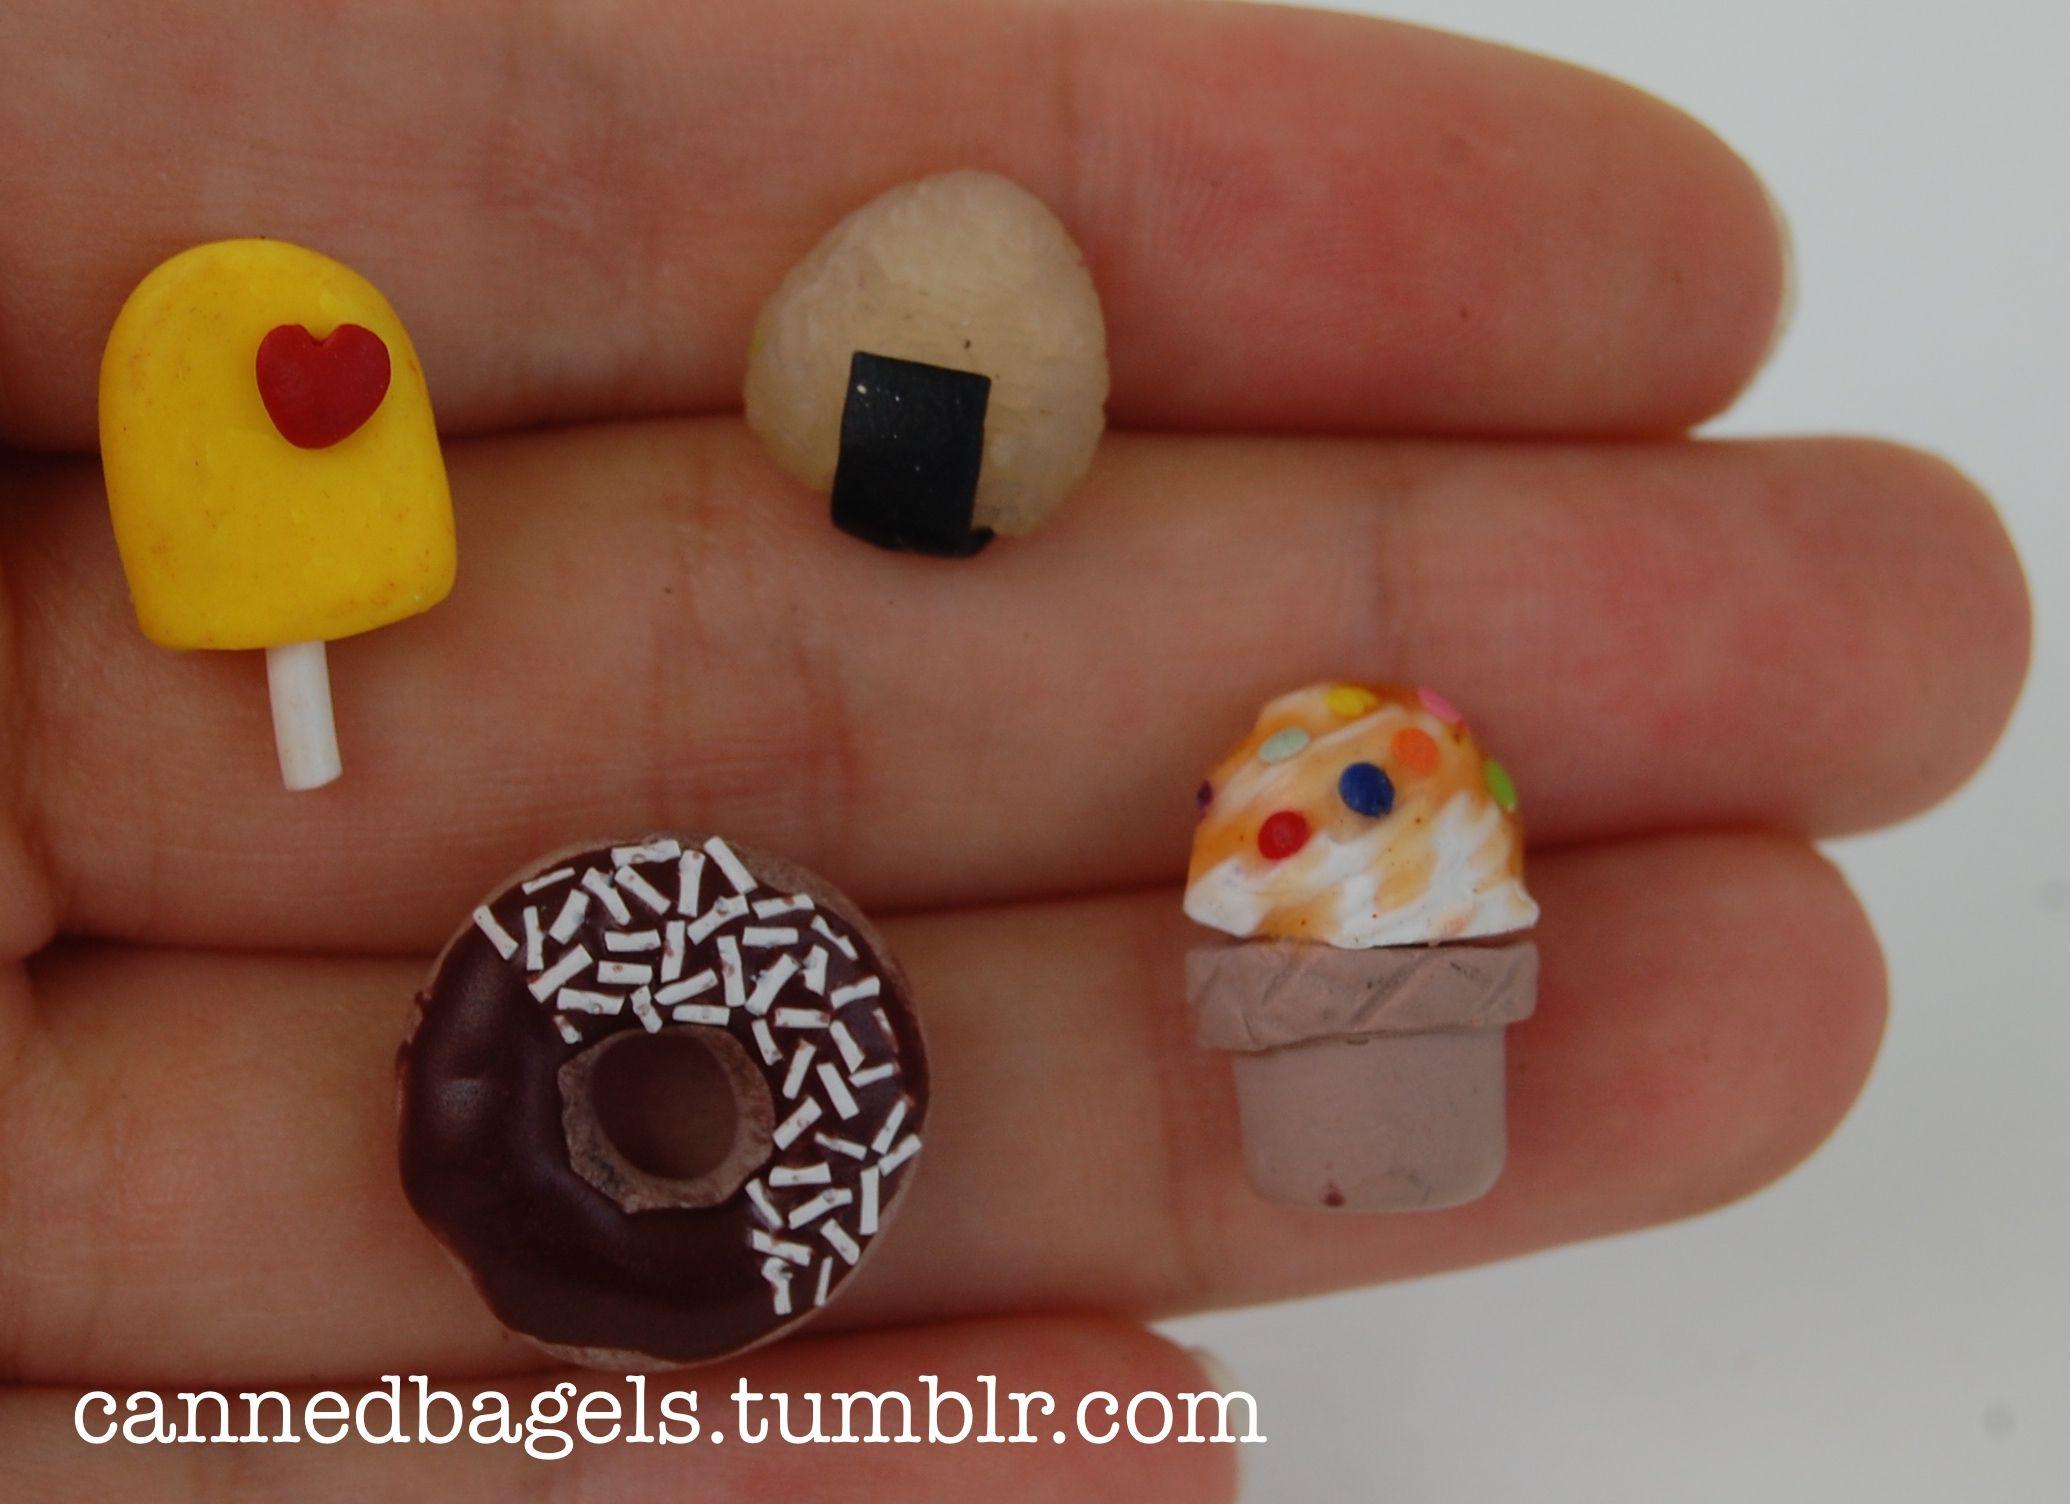 An assortment of random earrings by cannedbagels.tumblr.com, aka moi.